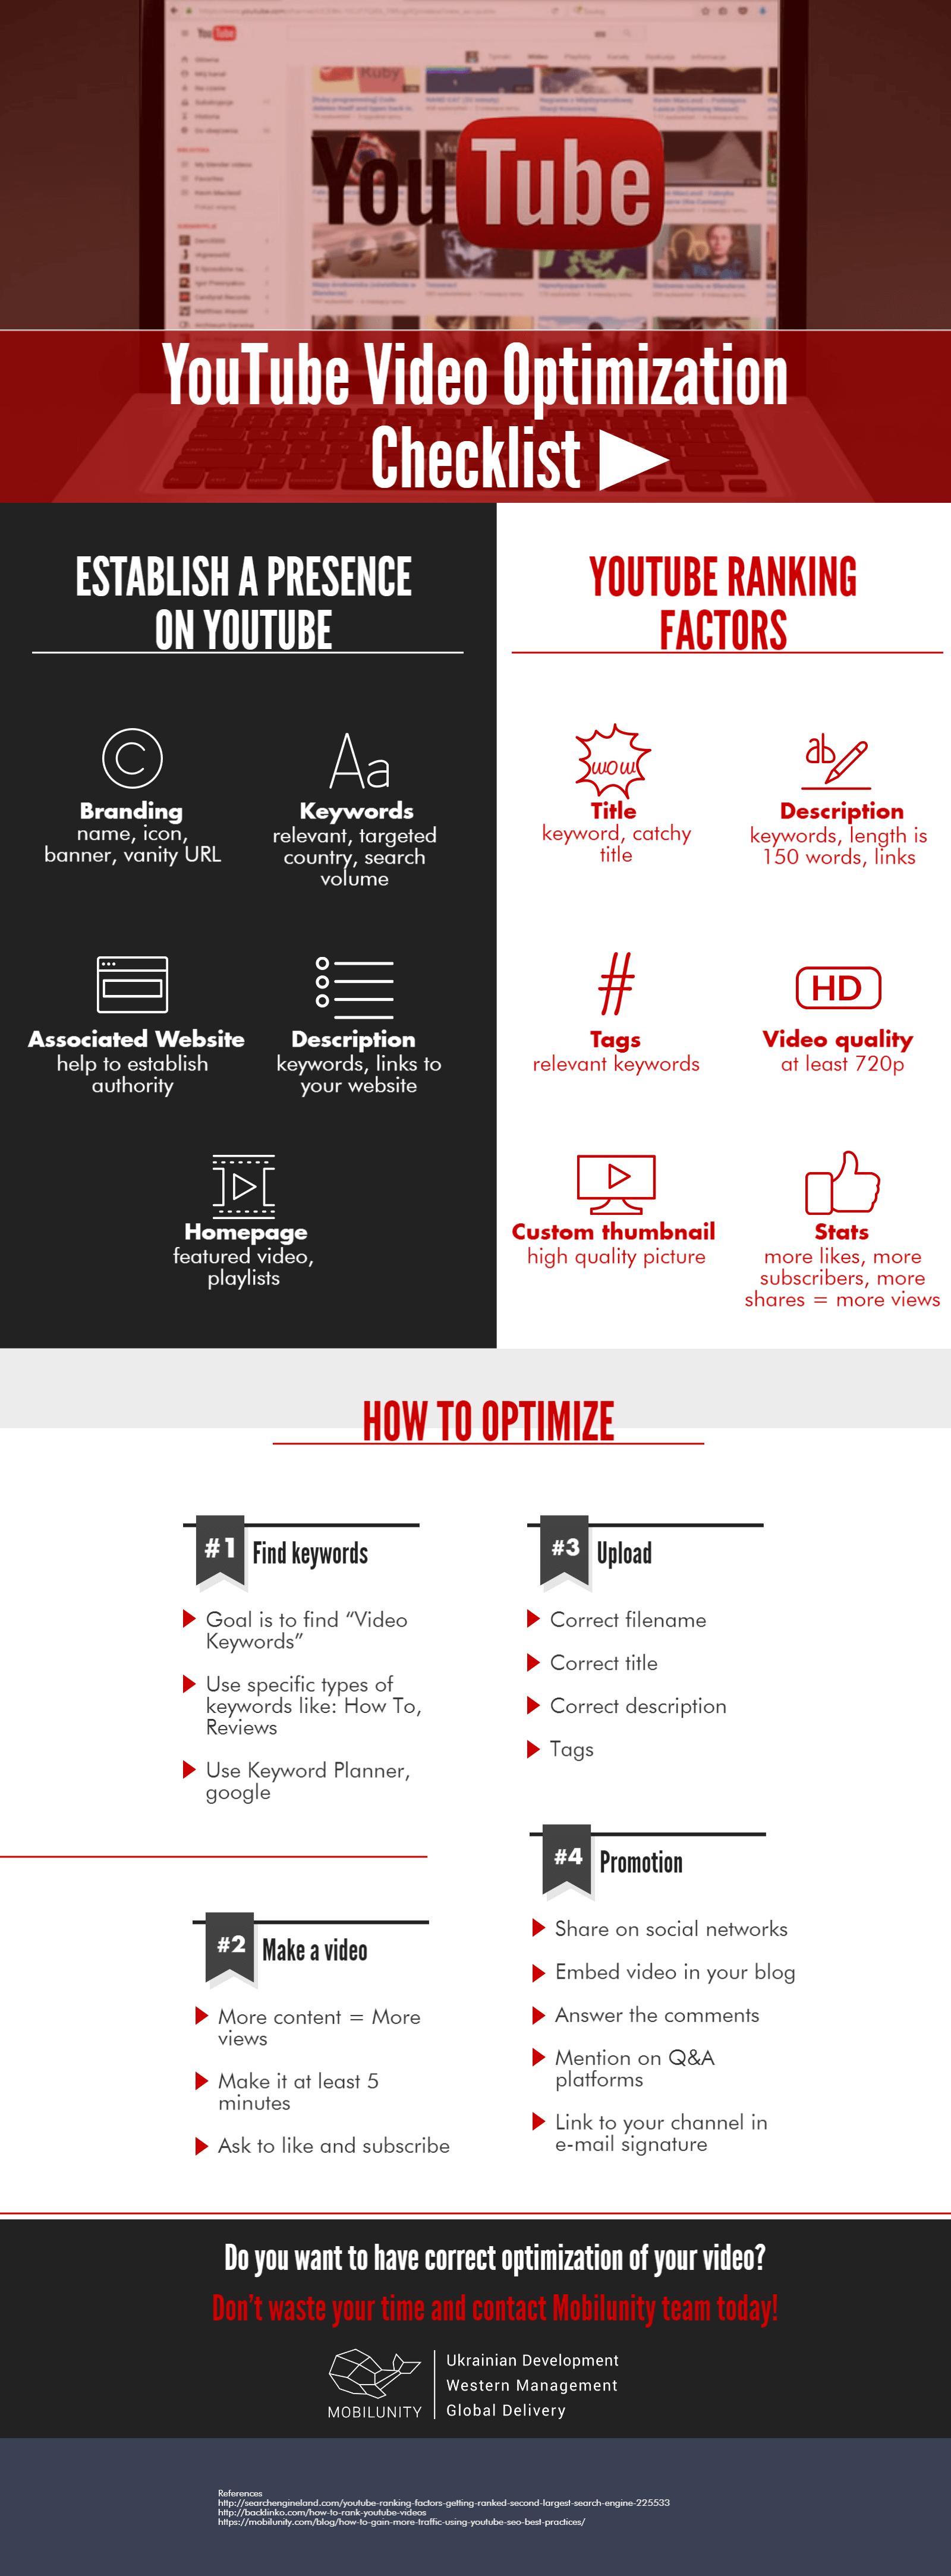 YouTube Video Optimization Checklist